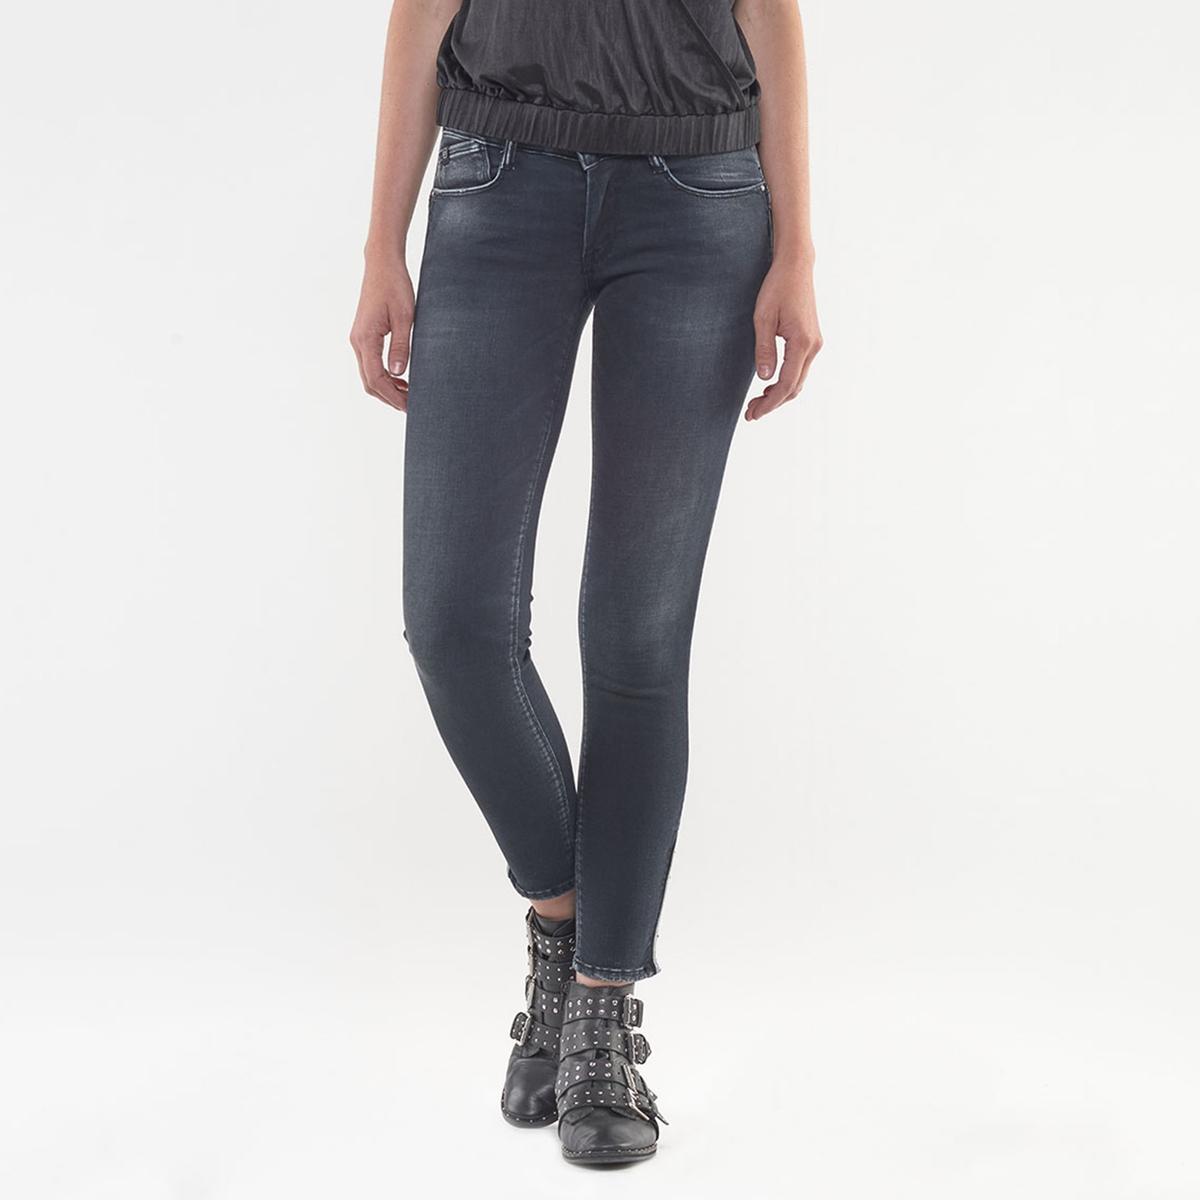 Джинсы La Redoute Узкие 27 (US) - 42/44 (RUS) черный джинсы la redoute узкие wilda 26 us 42 rus черный